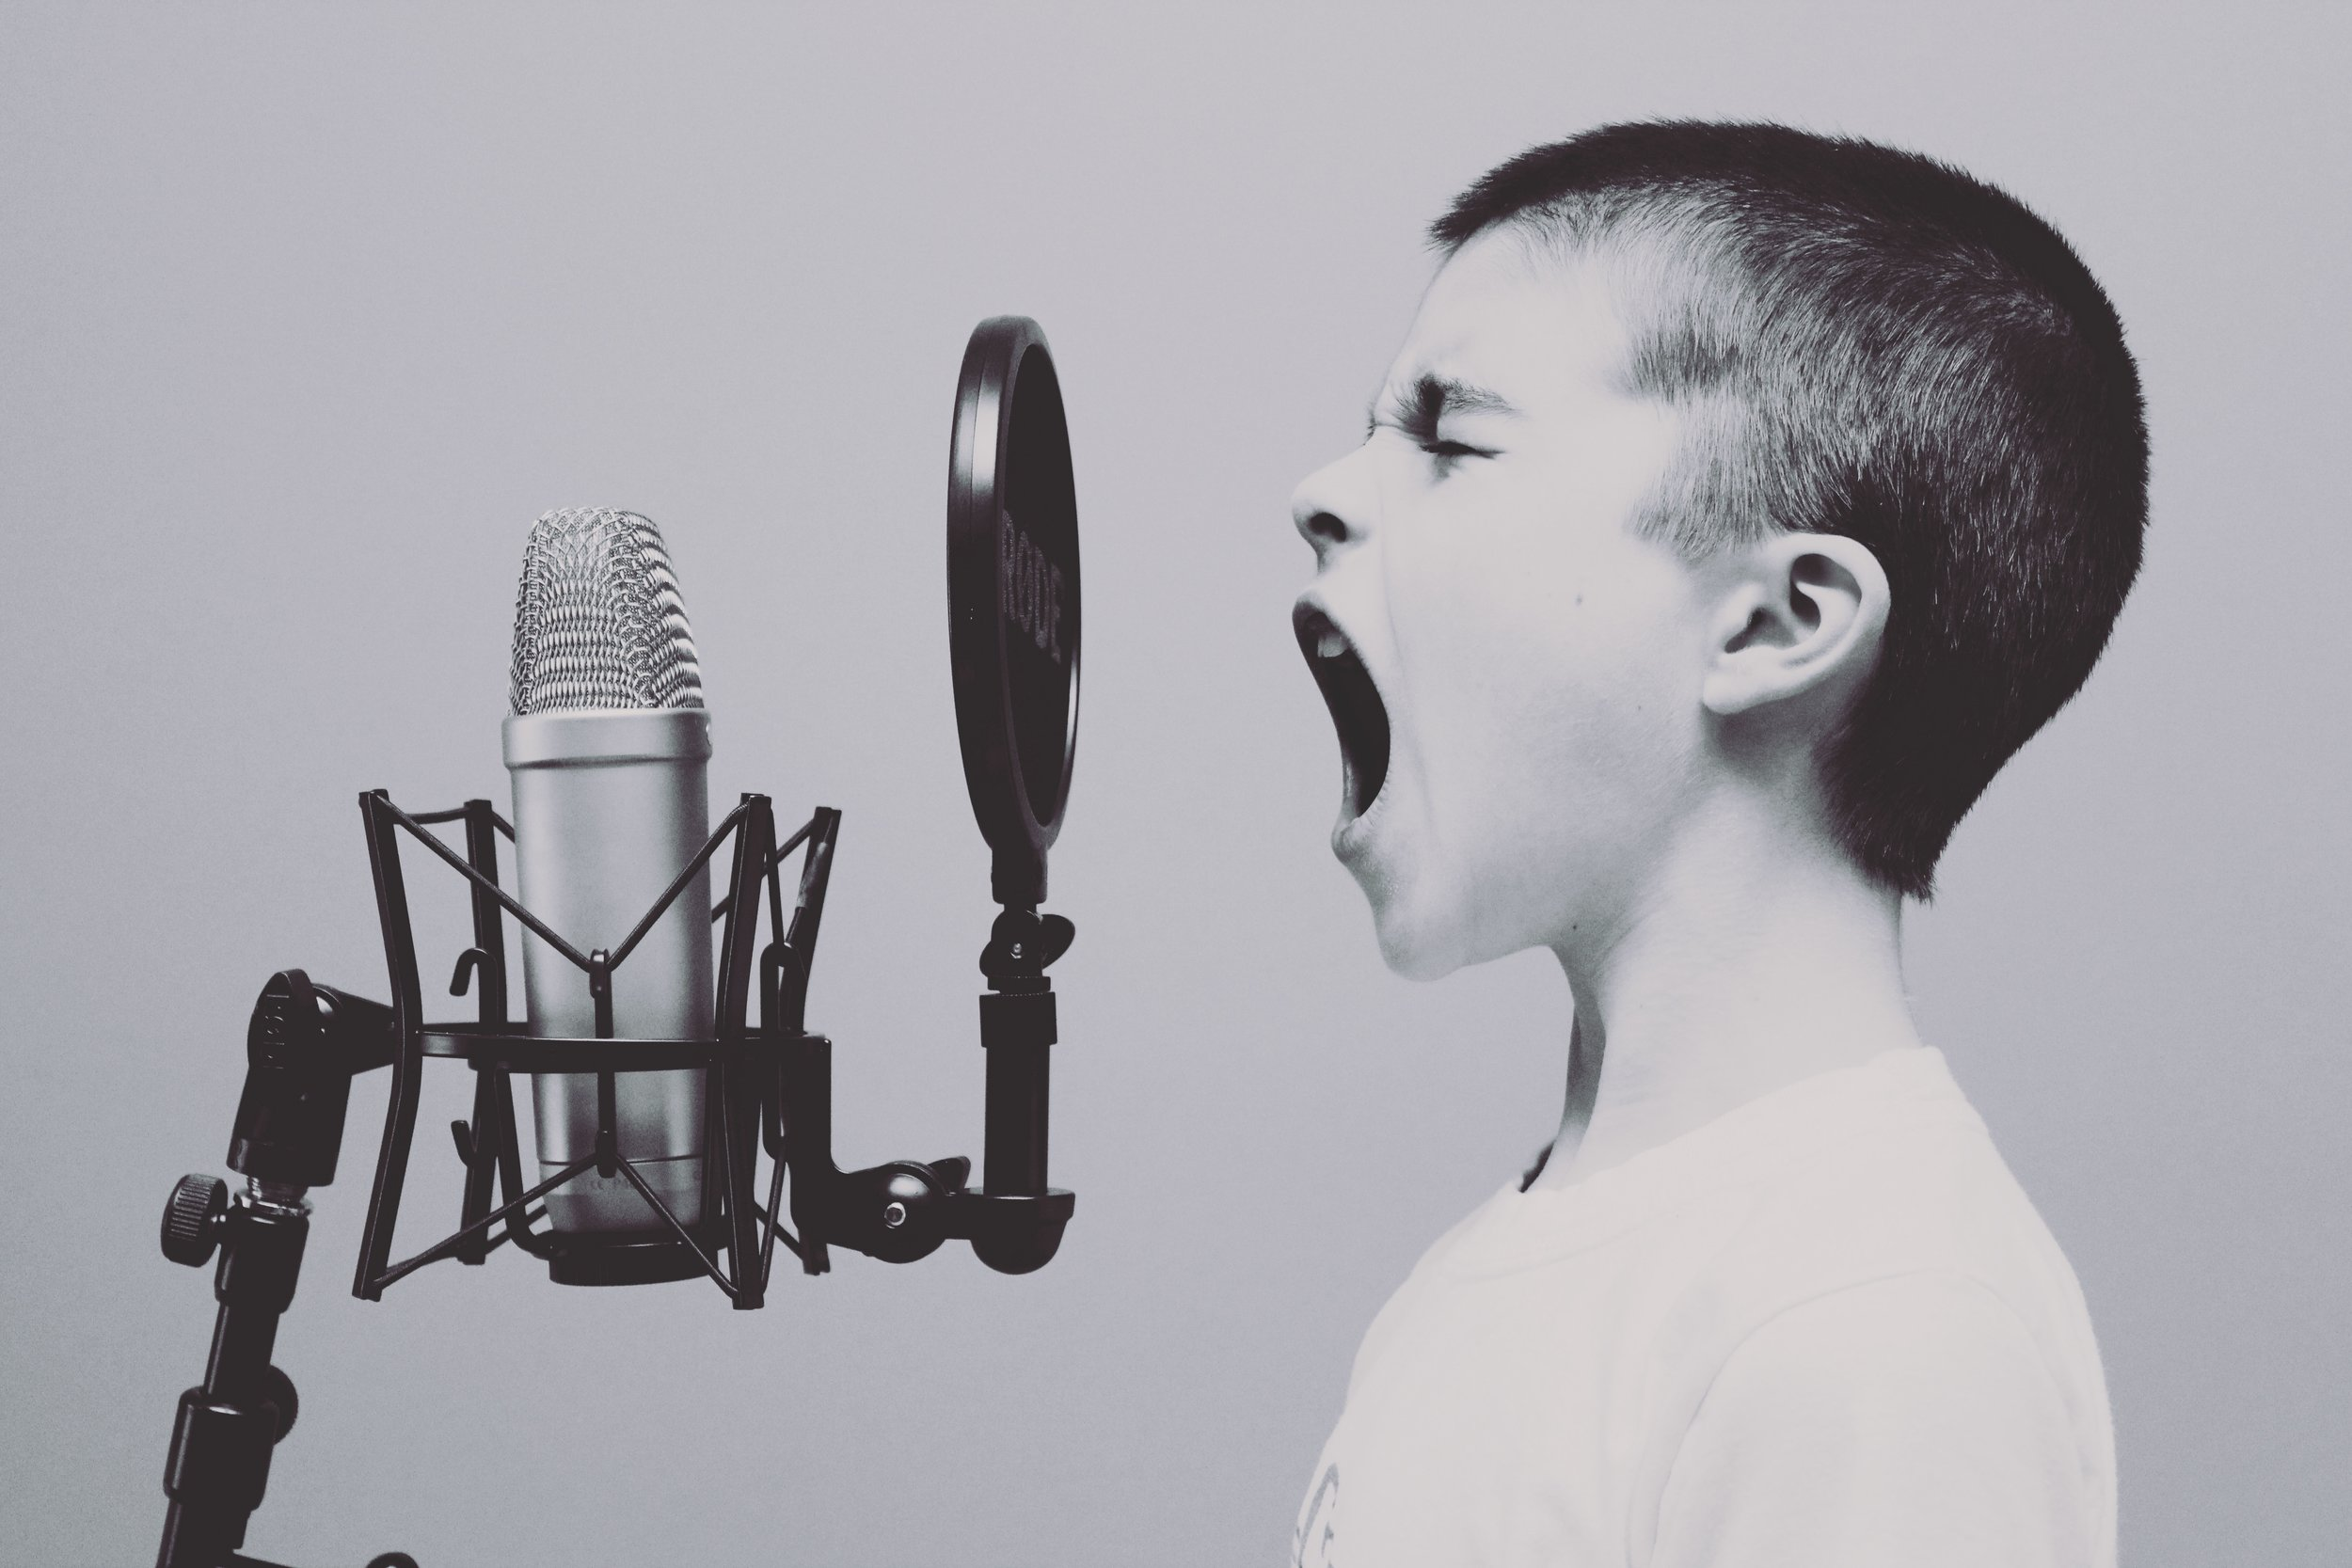 Kid Yelling into Mic.jpg